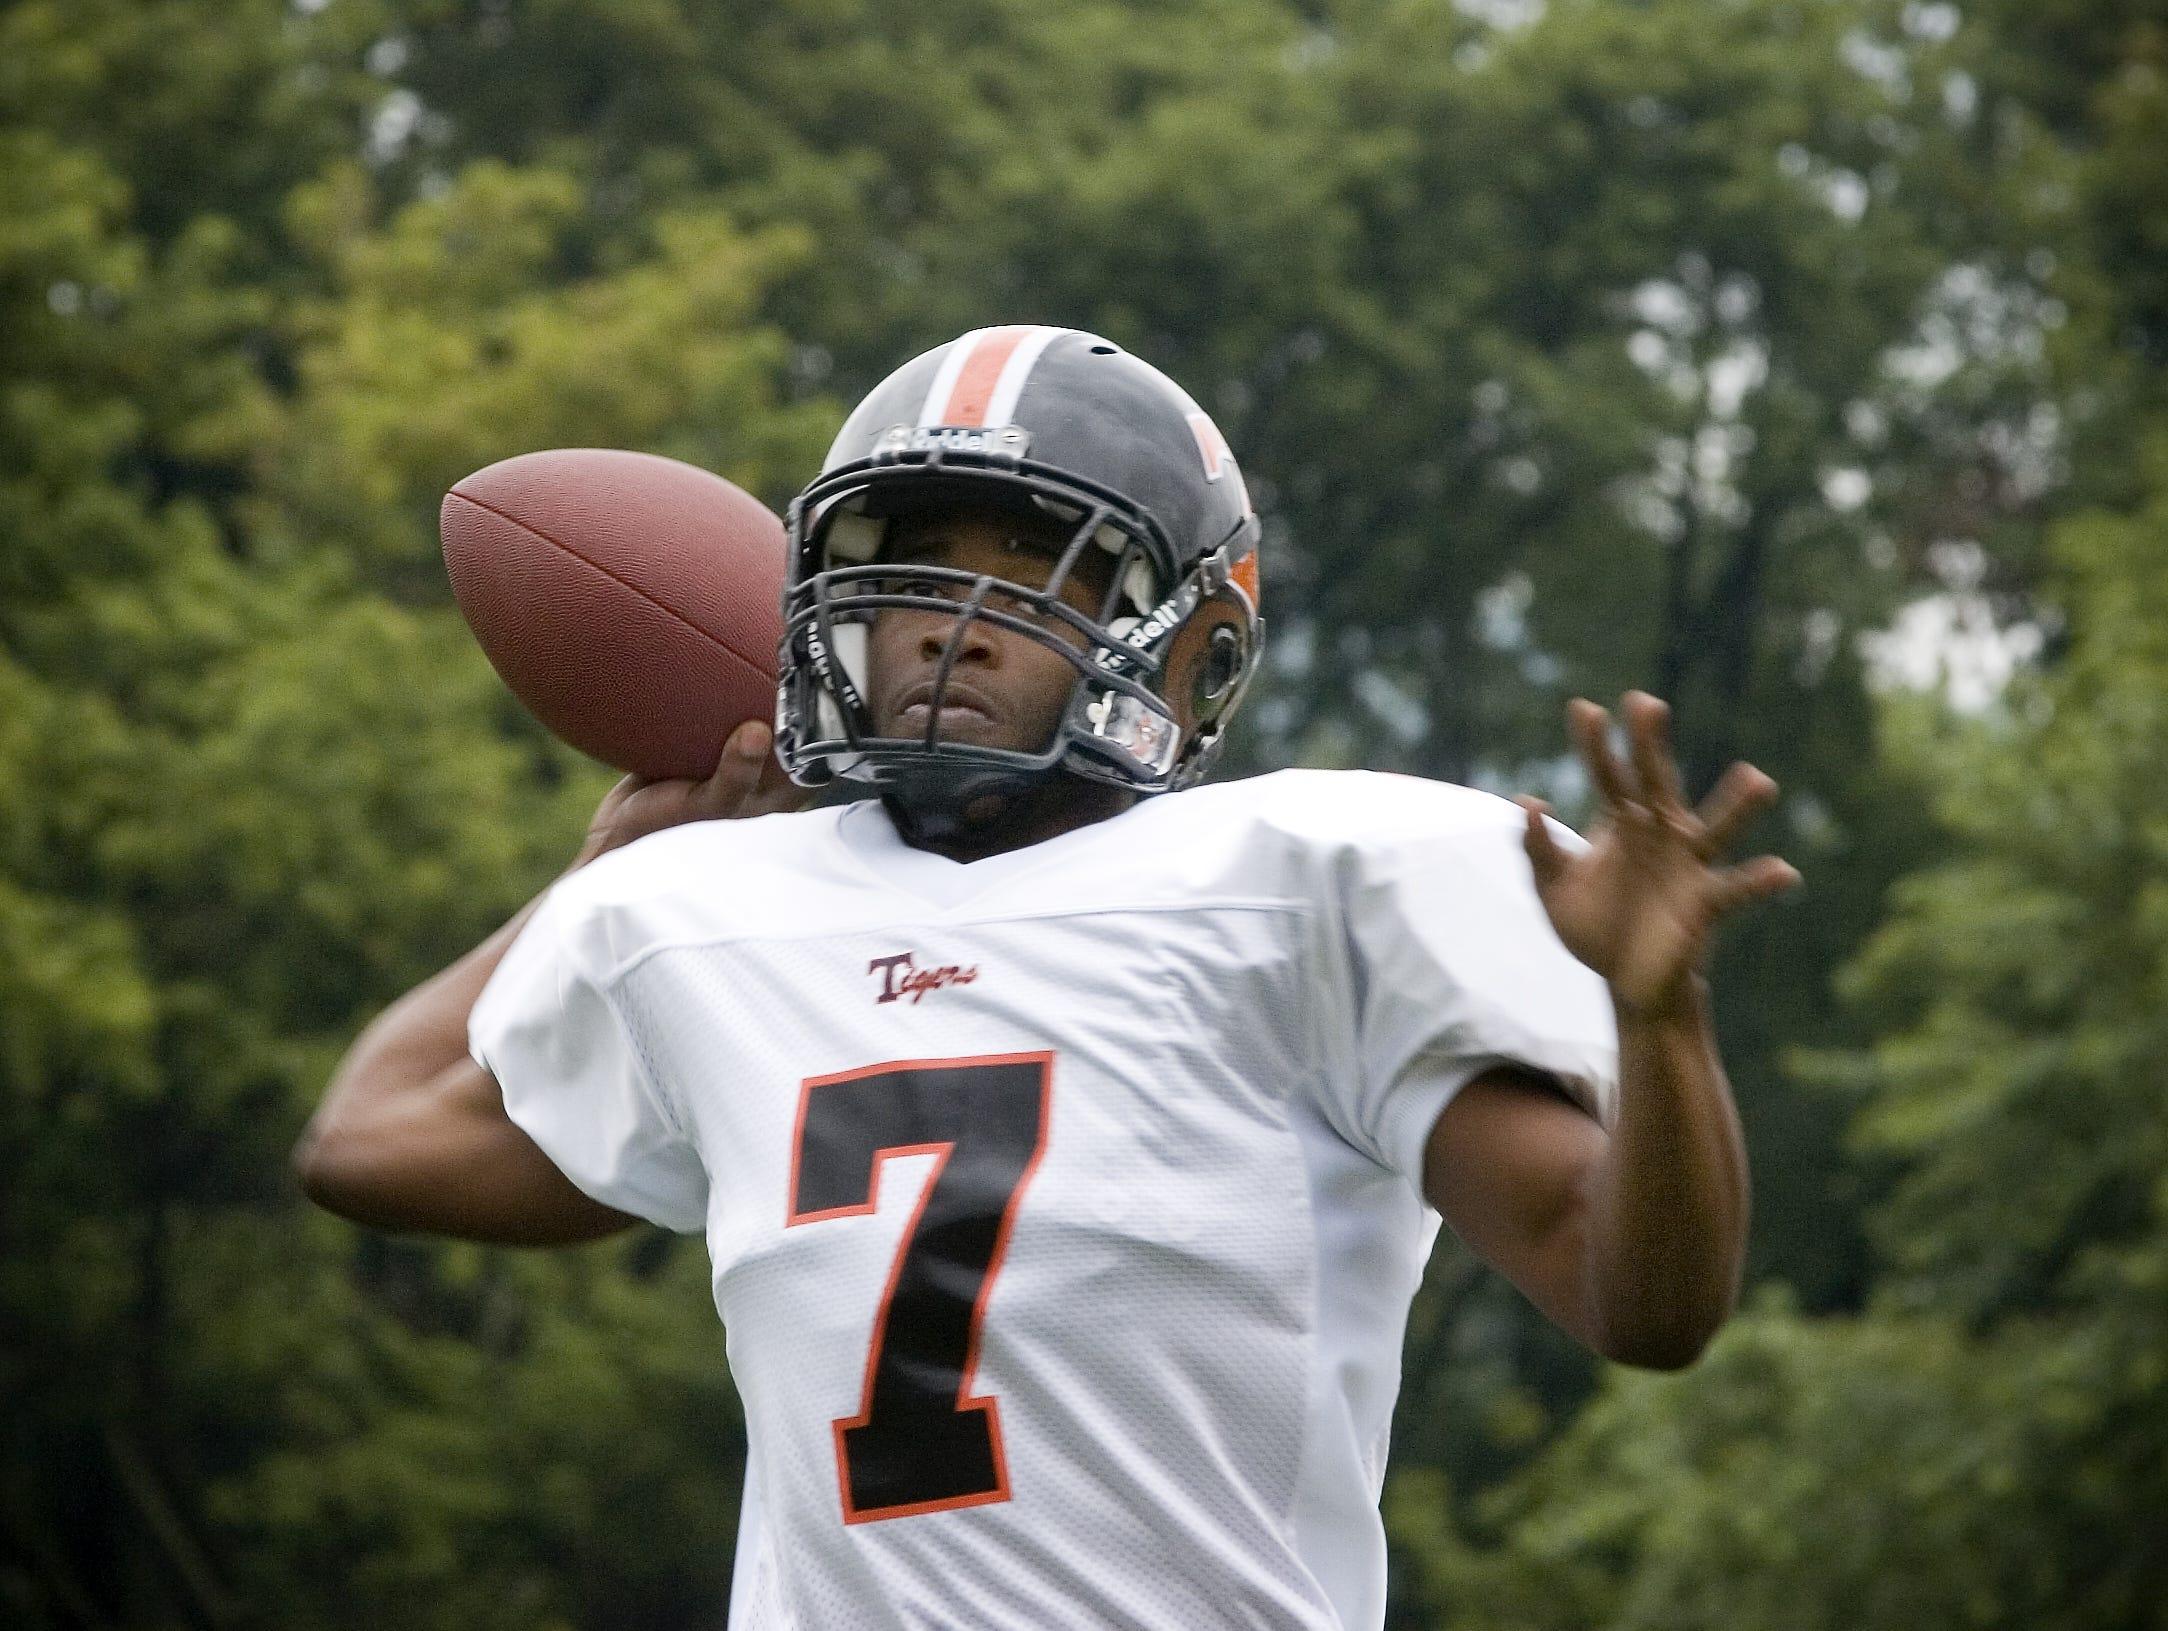 2006 Union-Endicott football starting quarterback Jermaine Thomas.